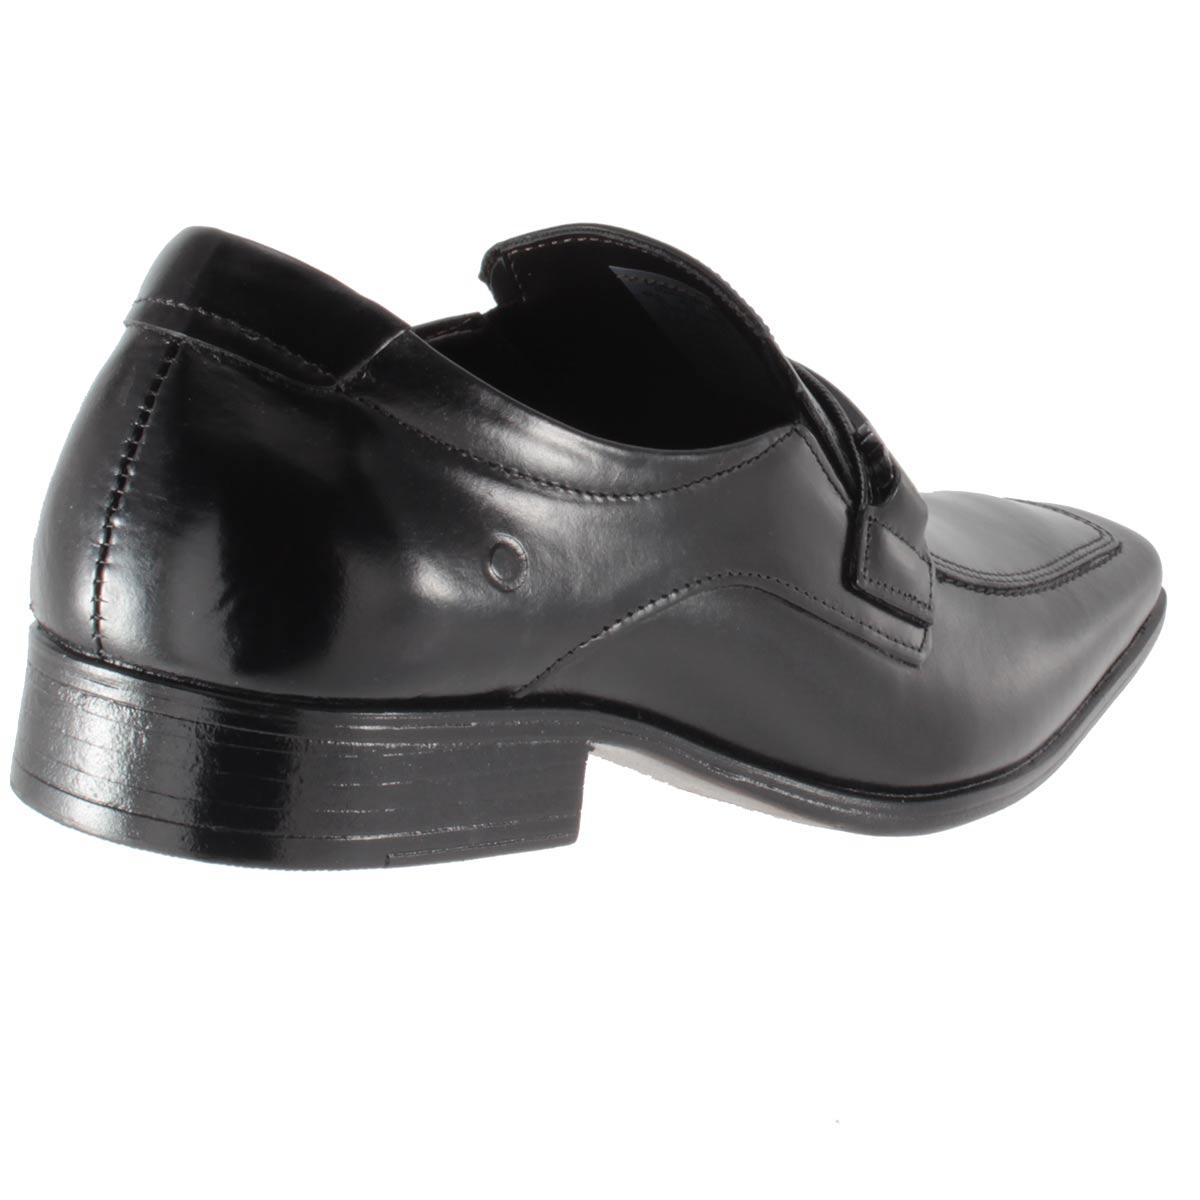 Sapato Social Democrata Denver Couro Fivela Masculino Lindo 450049